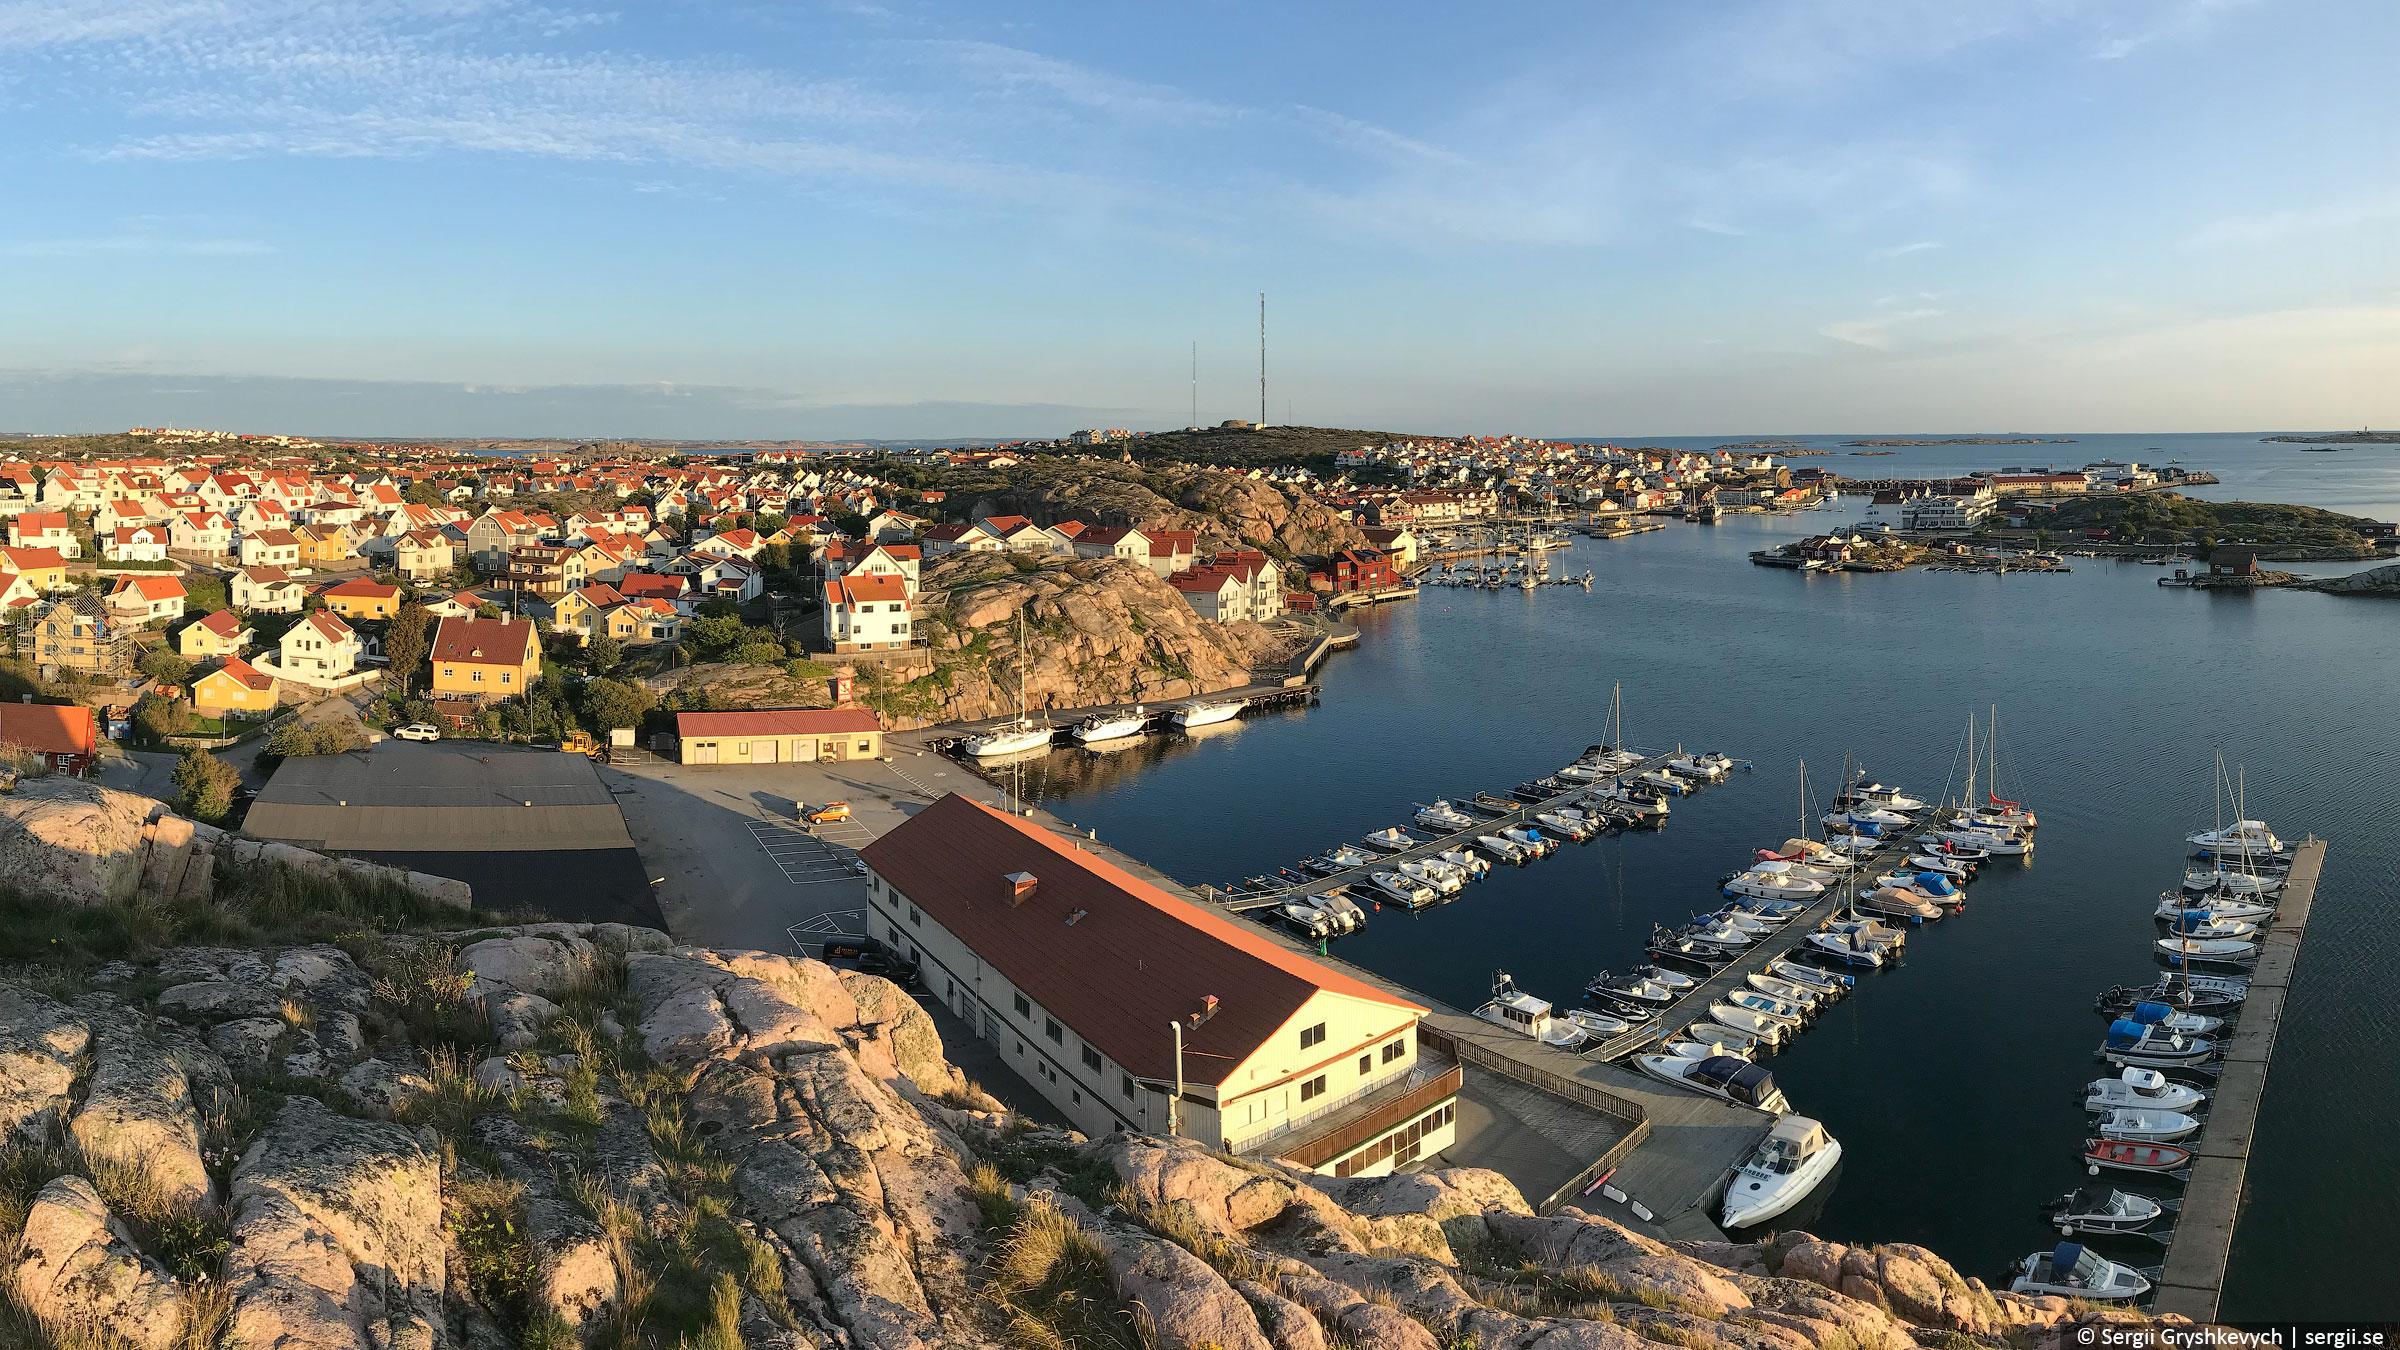 west-coast-sweden-2018-20